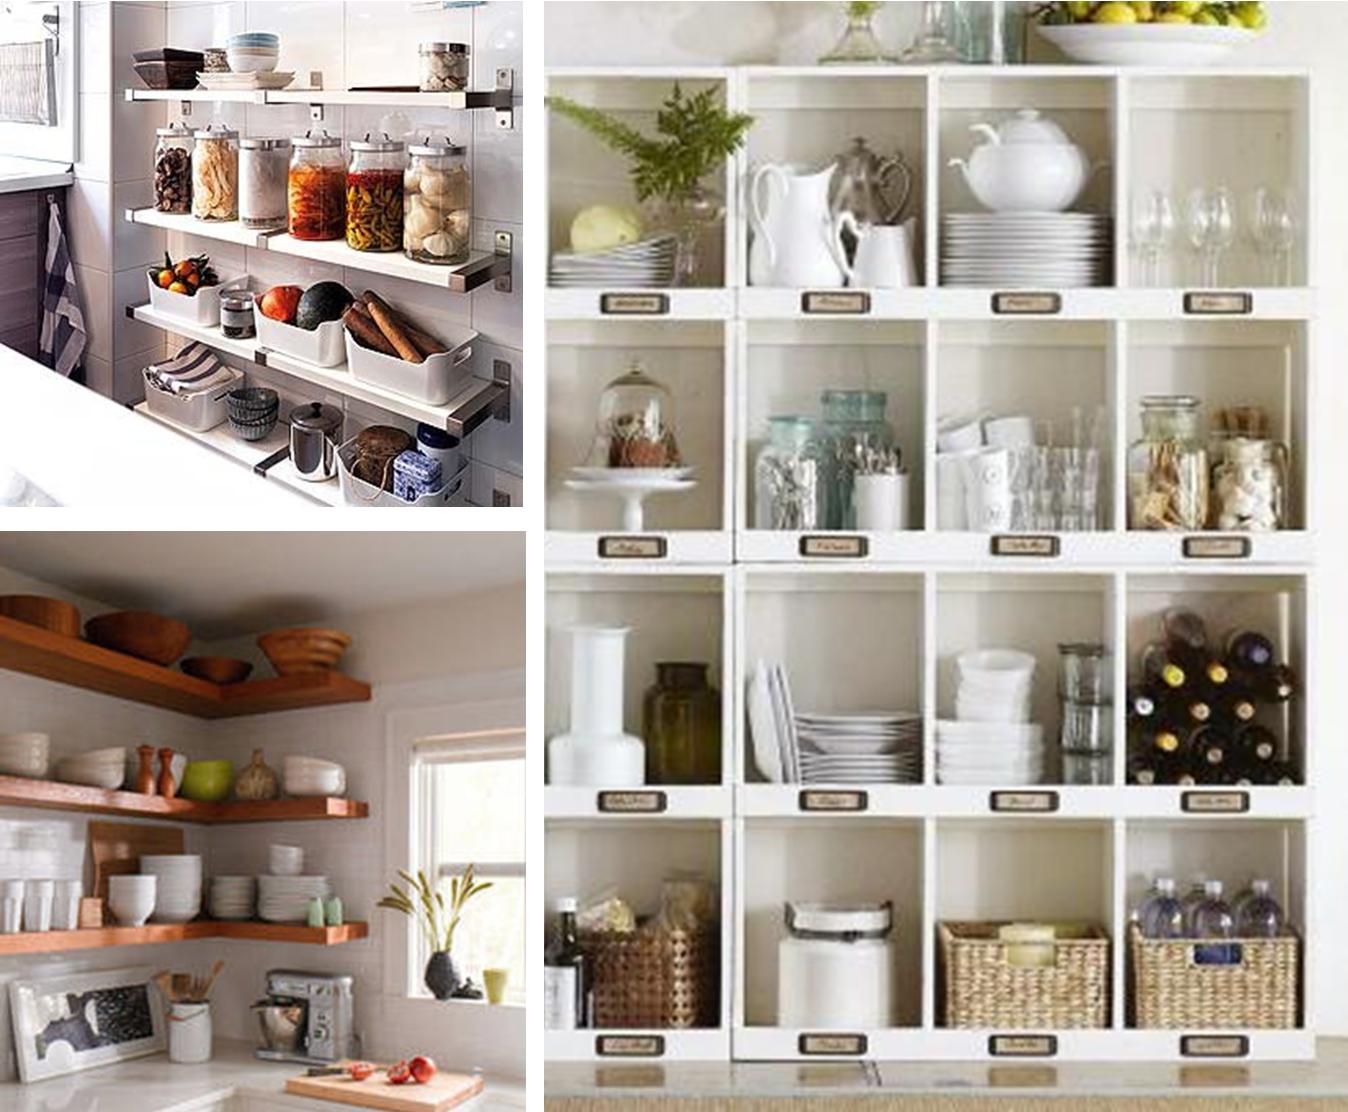 7 ideas para poner en orden la cocina baldas estanter as - Estanterias para cocina ...